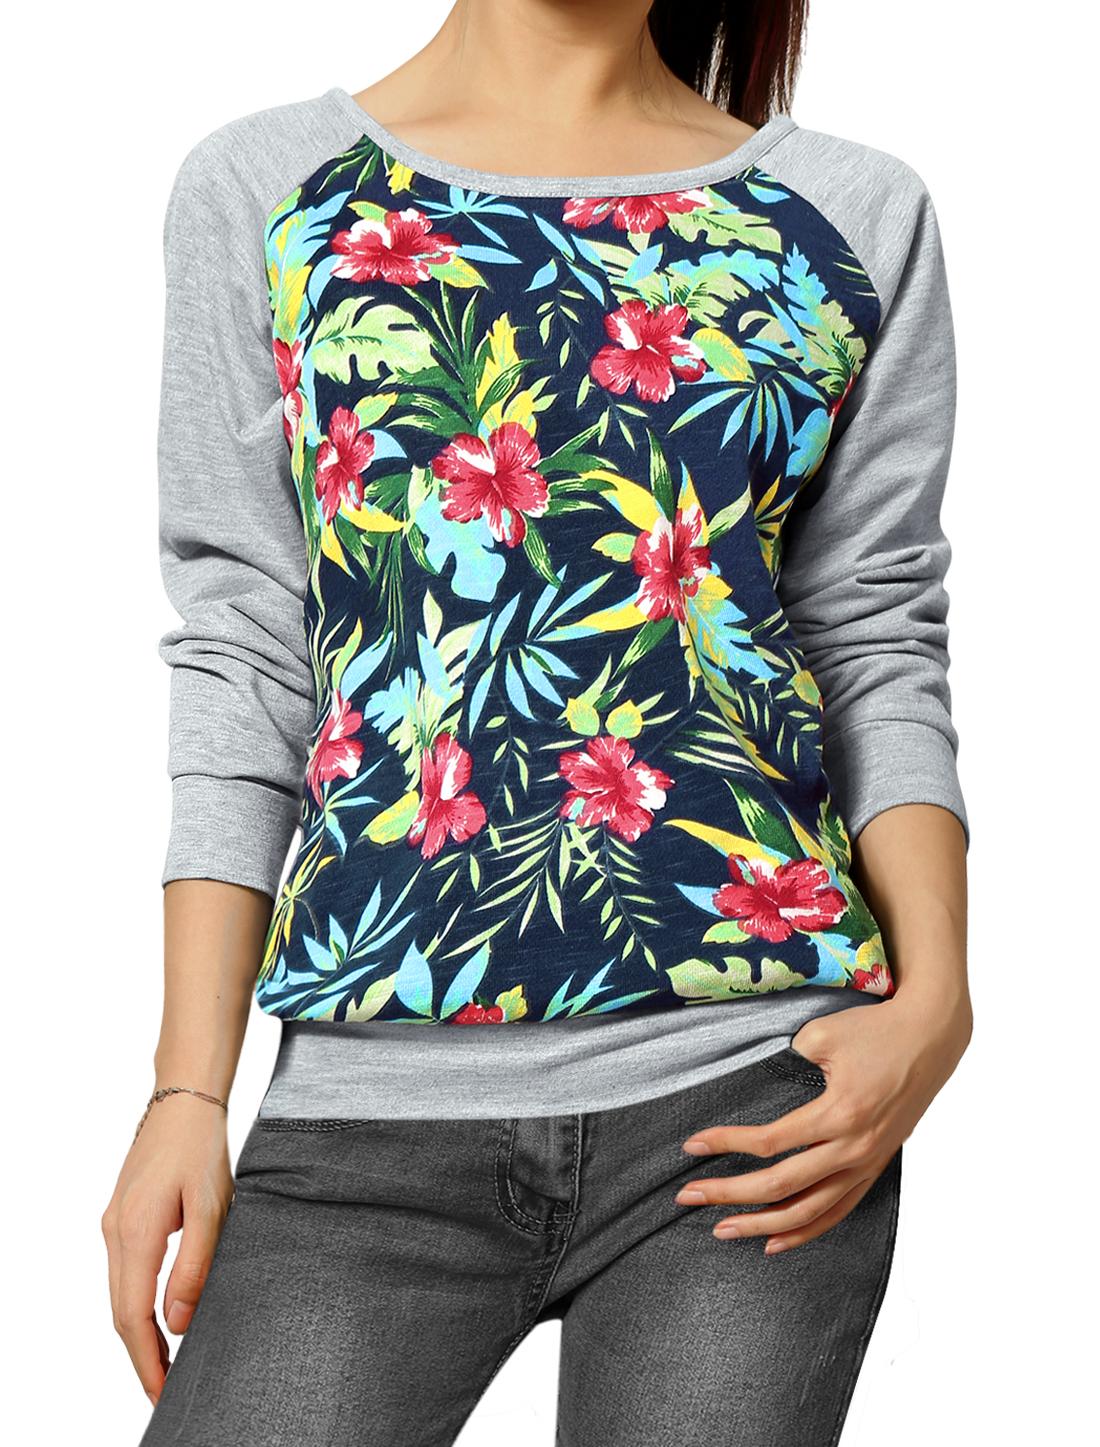 Woman Floral Prints Long Raglan Sleeves Casual Sweatshirt Gray Navy Blue M